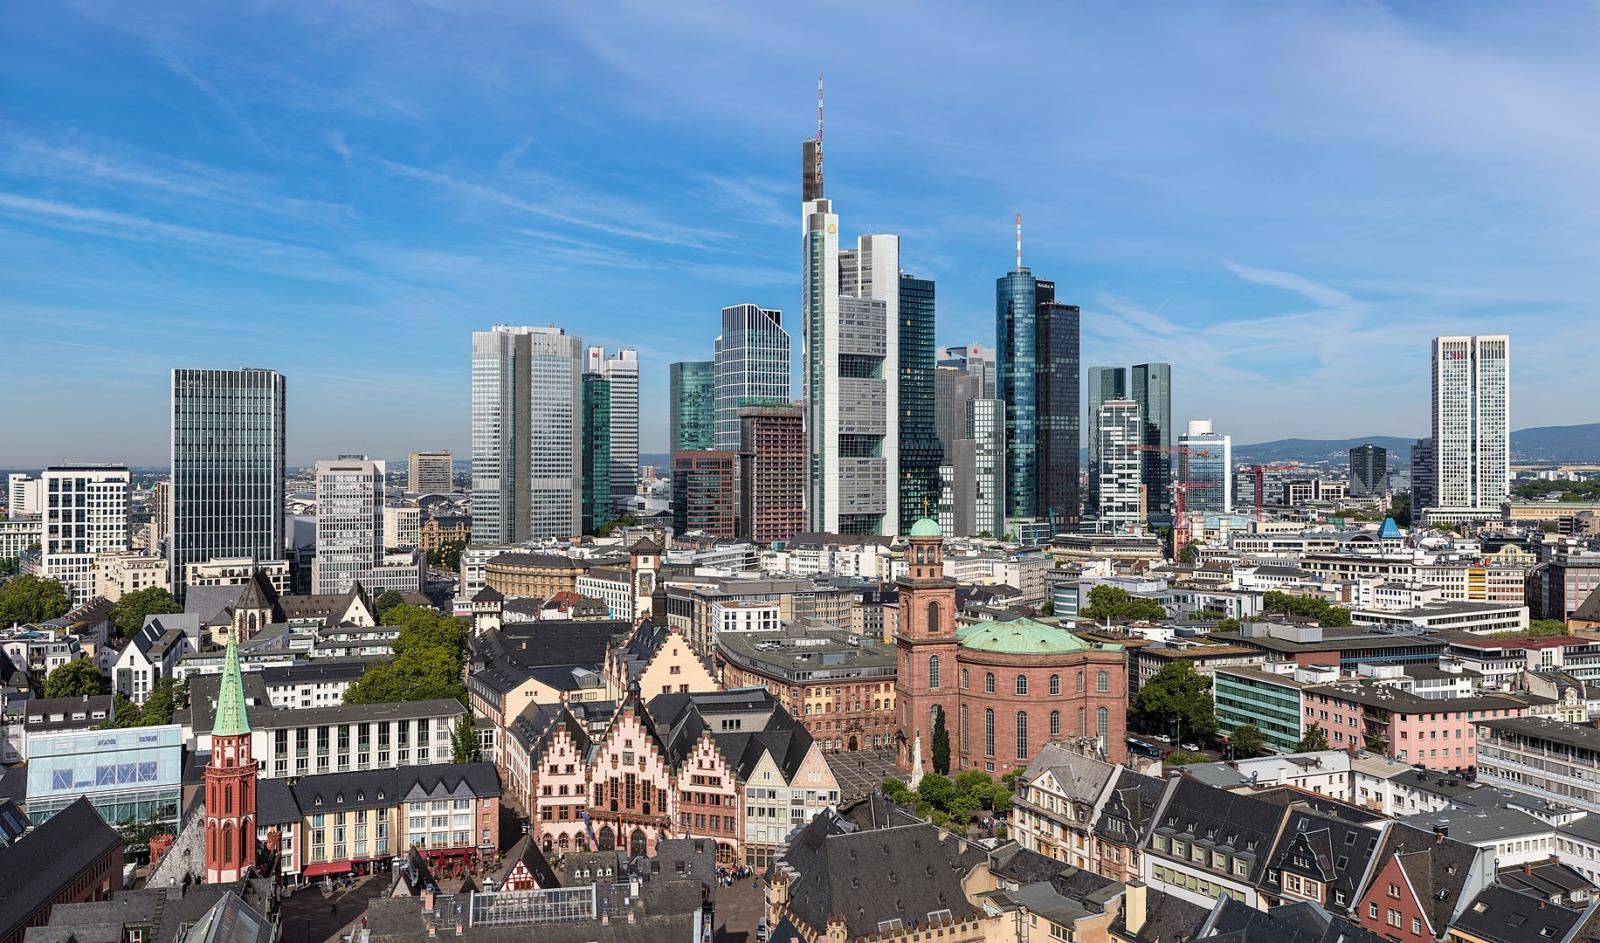 Frankfurt © Thomas Wolf - licence [CC BY-SA 3.0de] from Wikimedia Commons